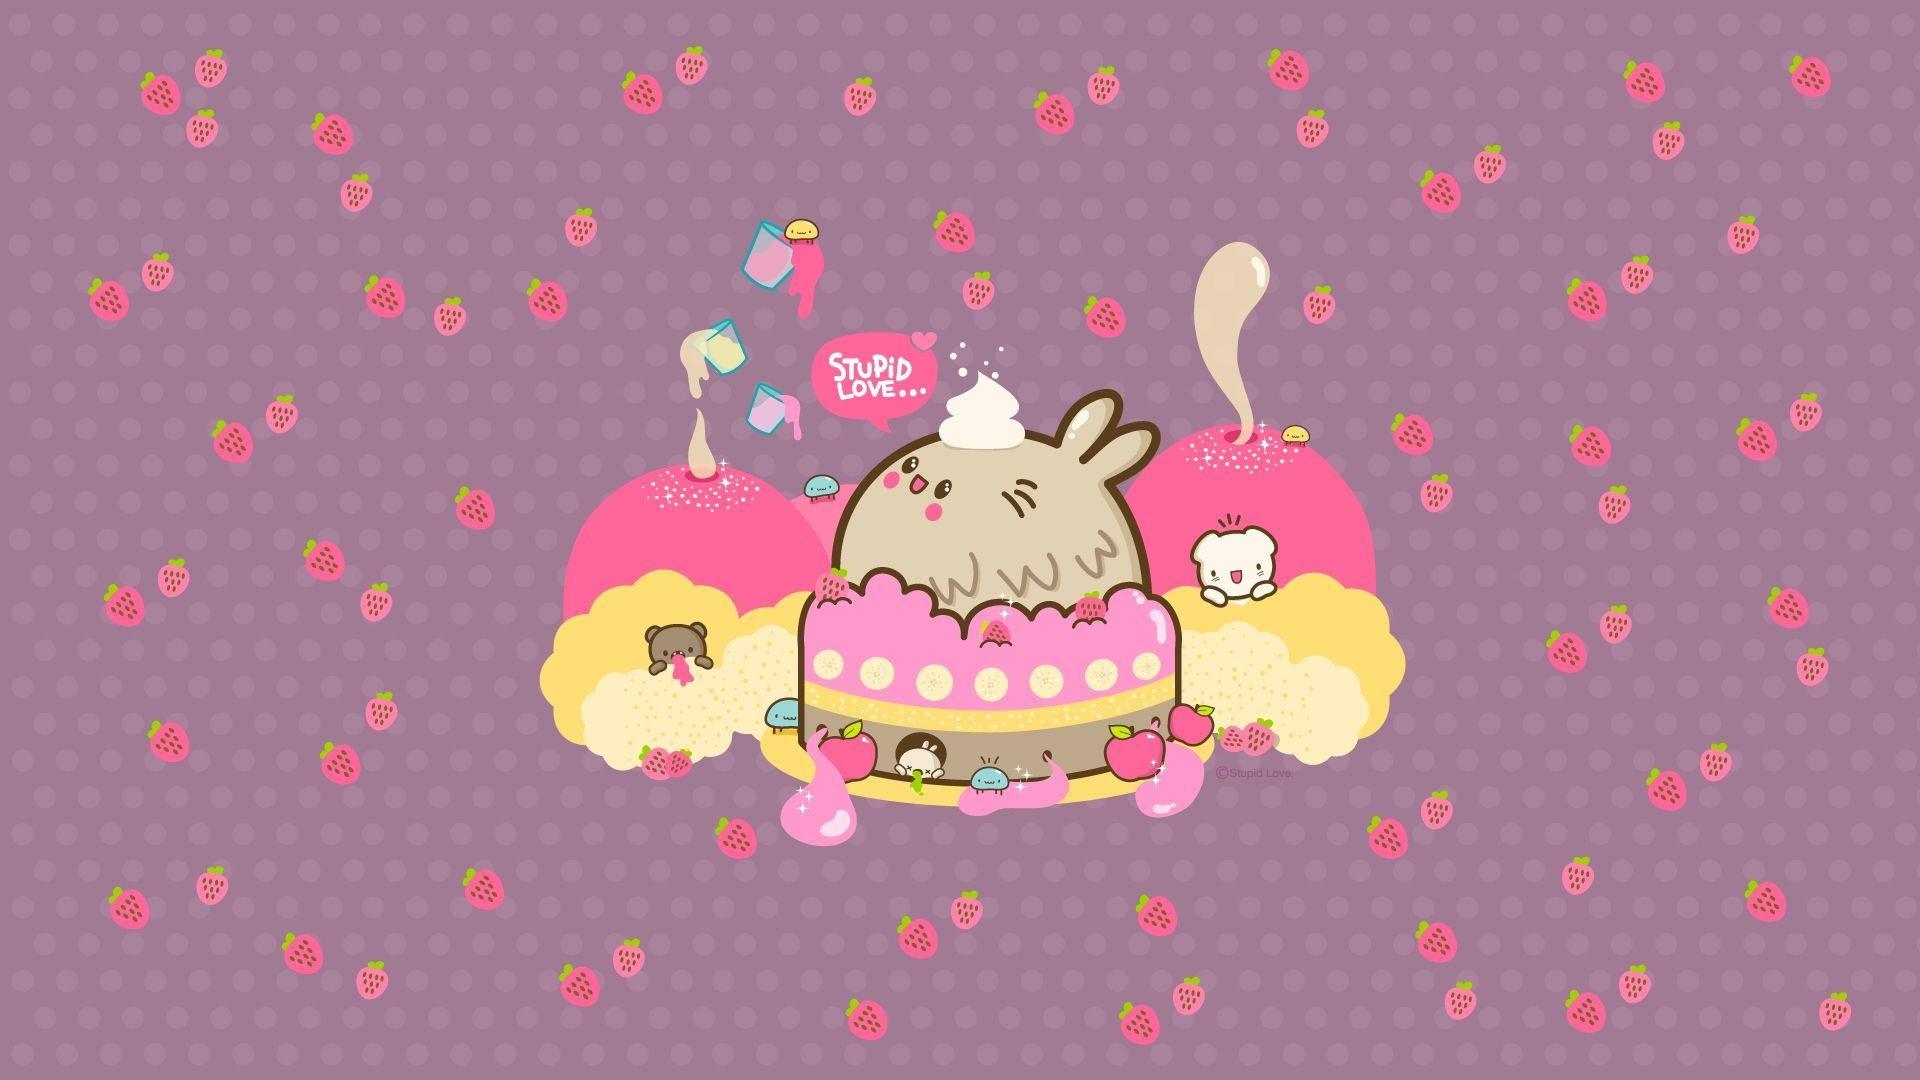 Cute Kitty Wallpapers Download Kawaii Wallpaper 75 Images